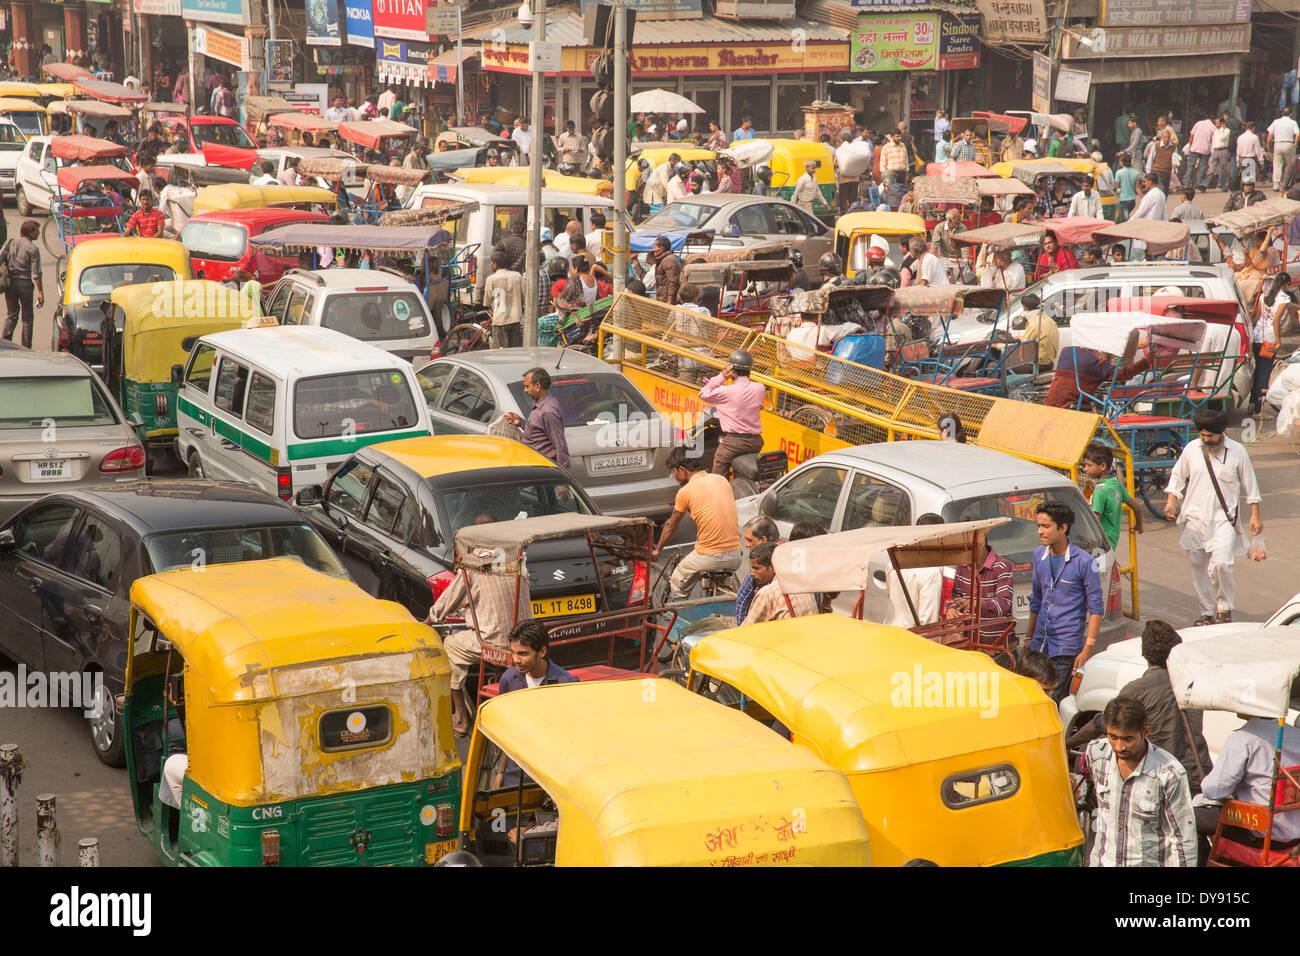 Traffic, Delhi, Asia, town, city, market, cars, automobiles, many, traffic jam - Stock Image